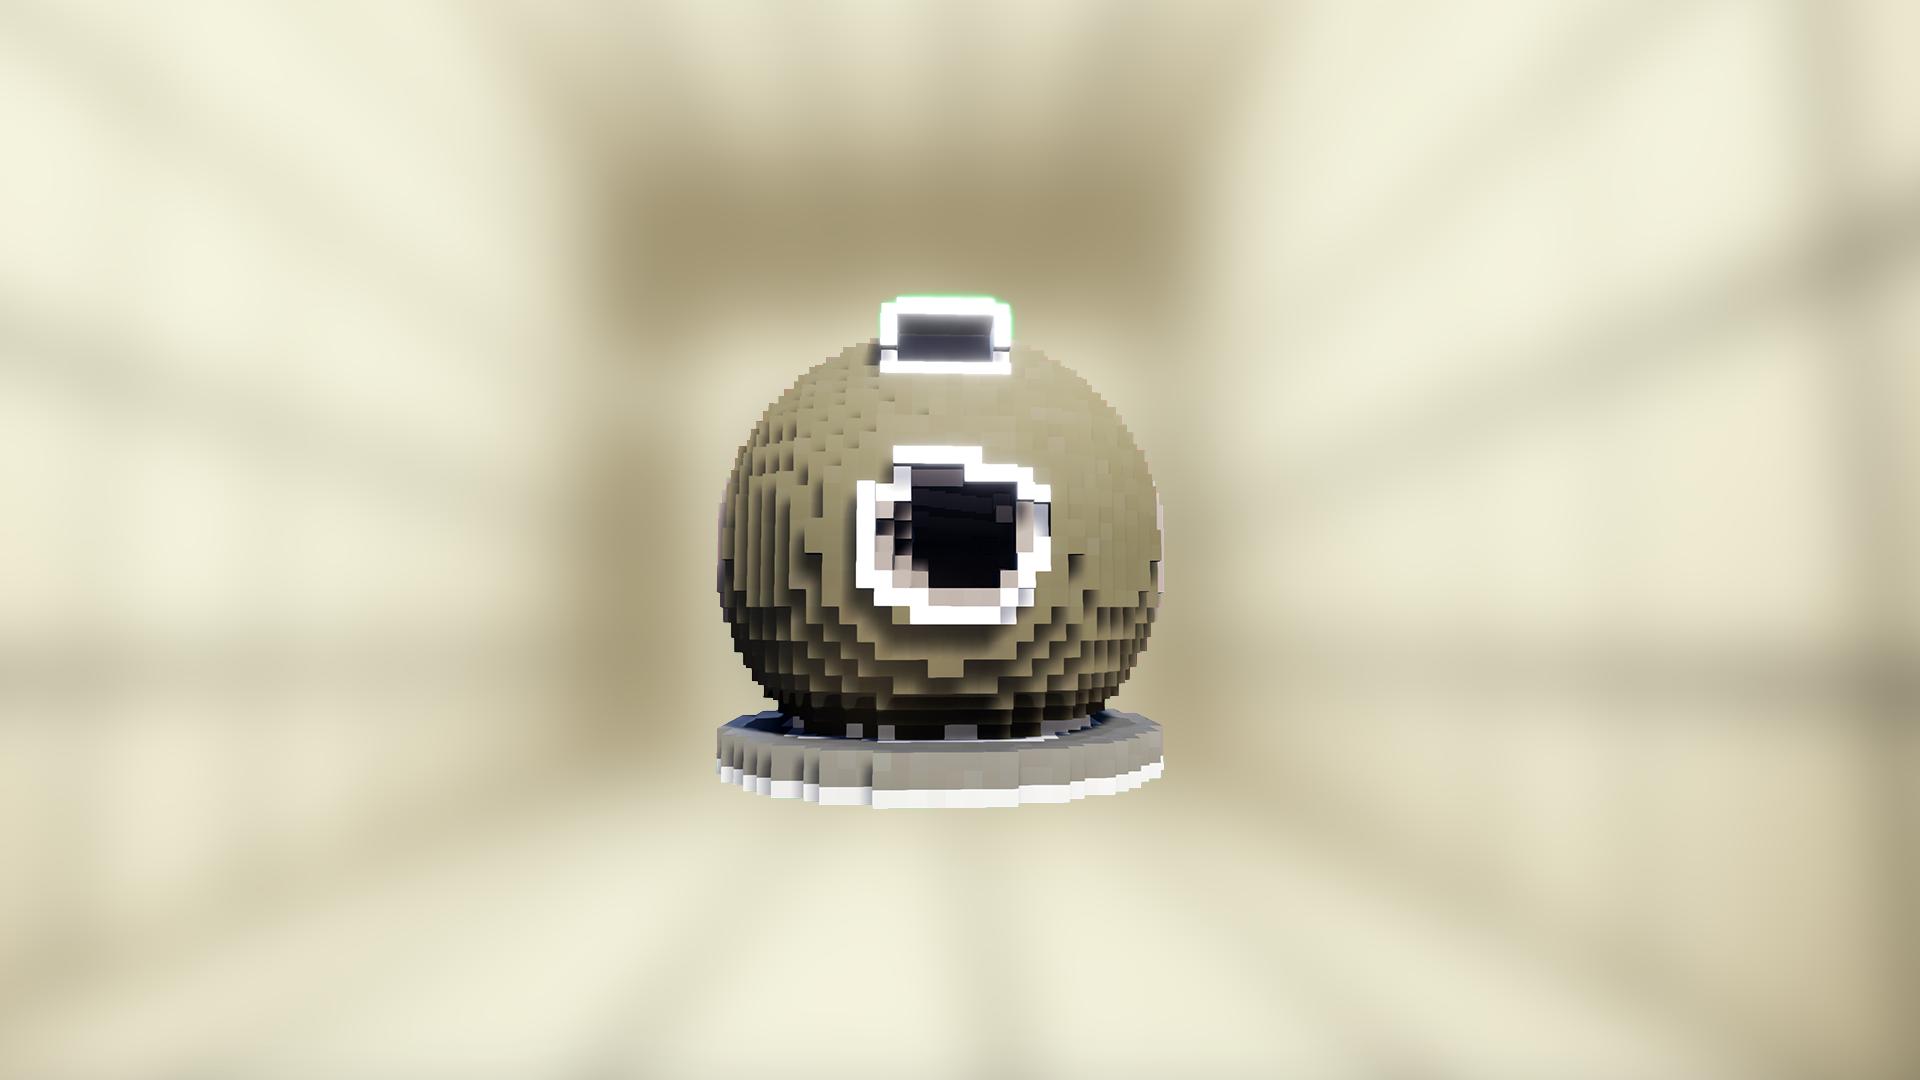 Icon for 25 enemies